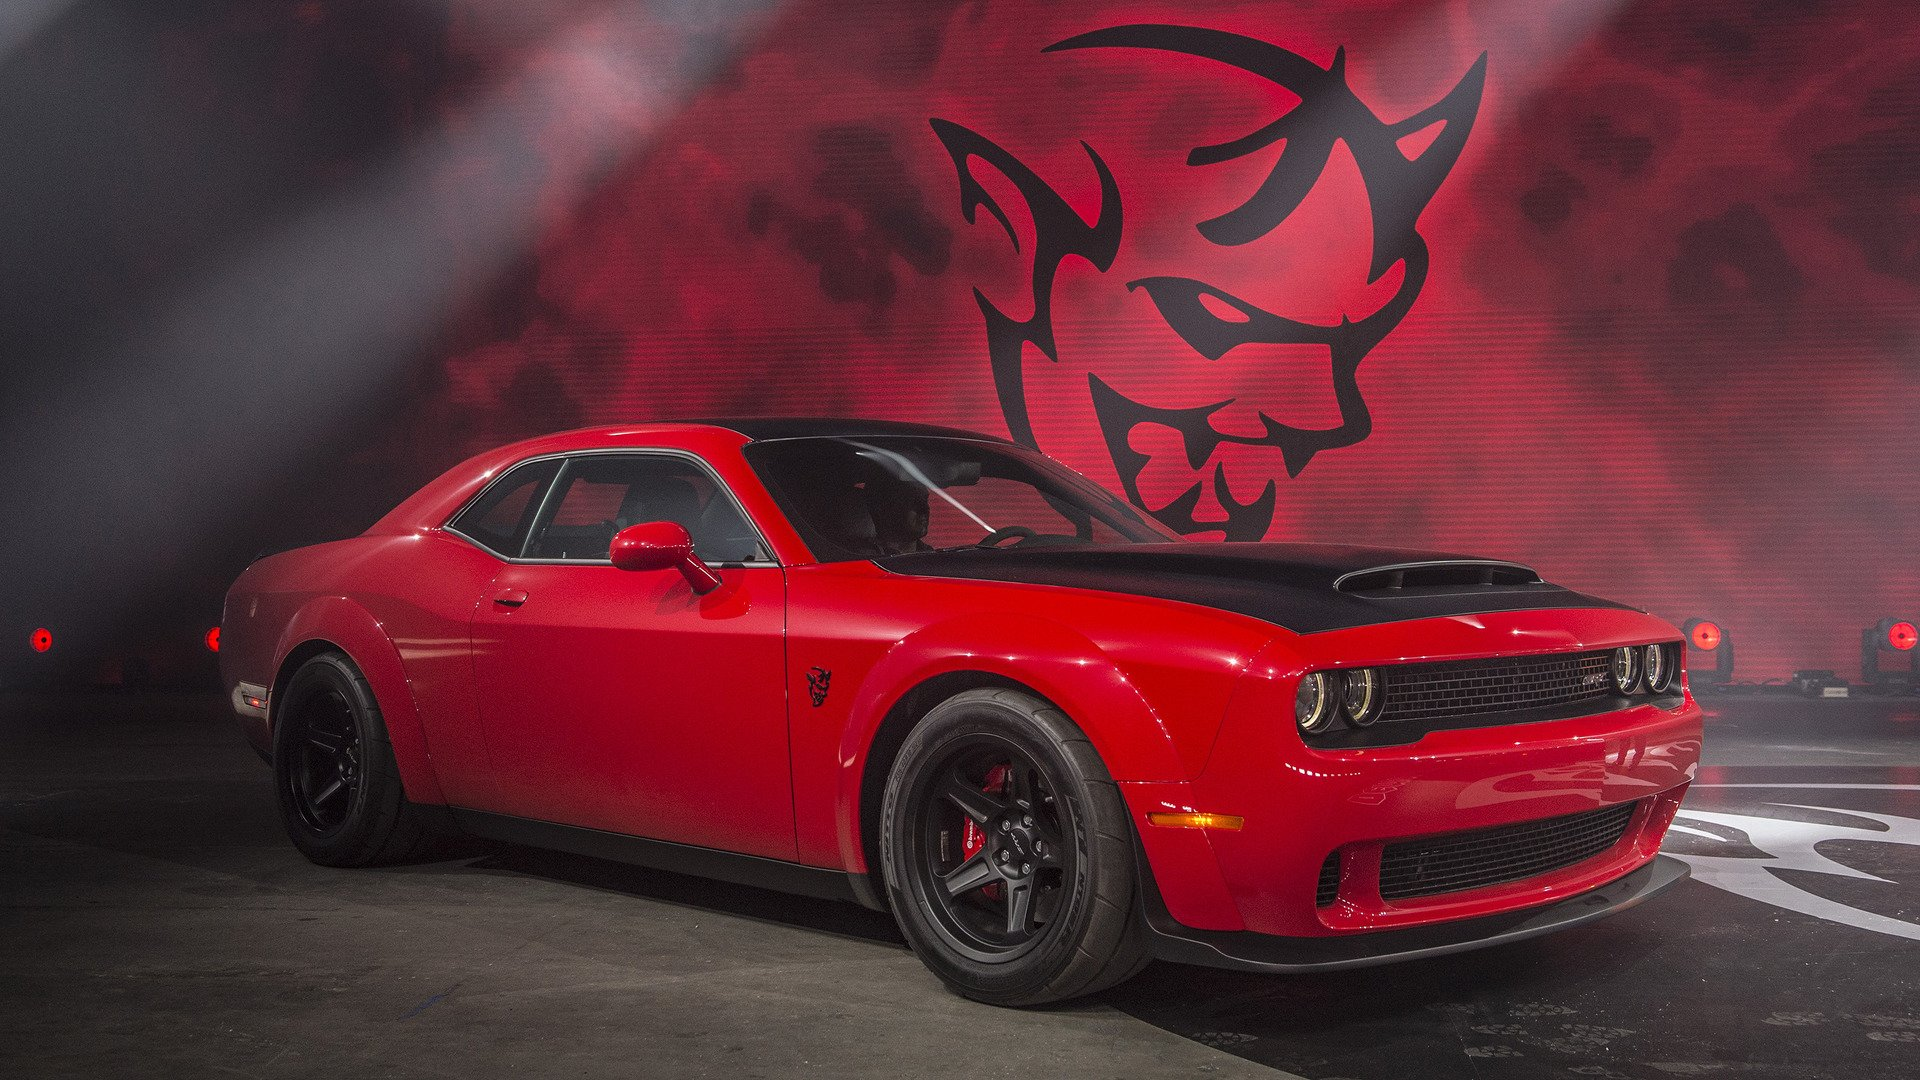 Muscle Car Wallpaper Iphone 6 Dodge Challenger Srt Demon Full Hd Papel De Parede And